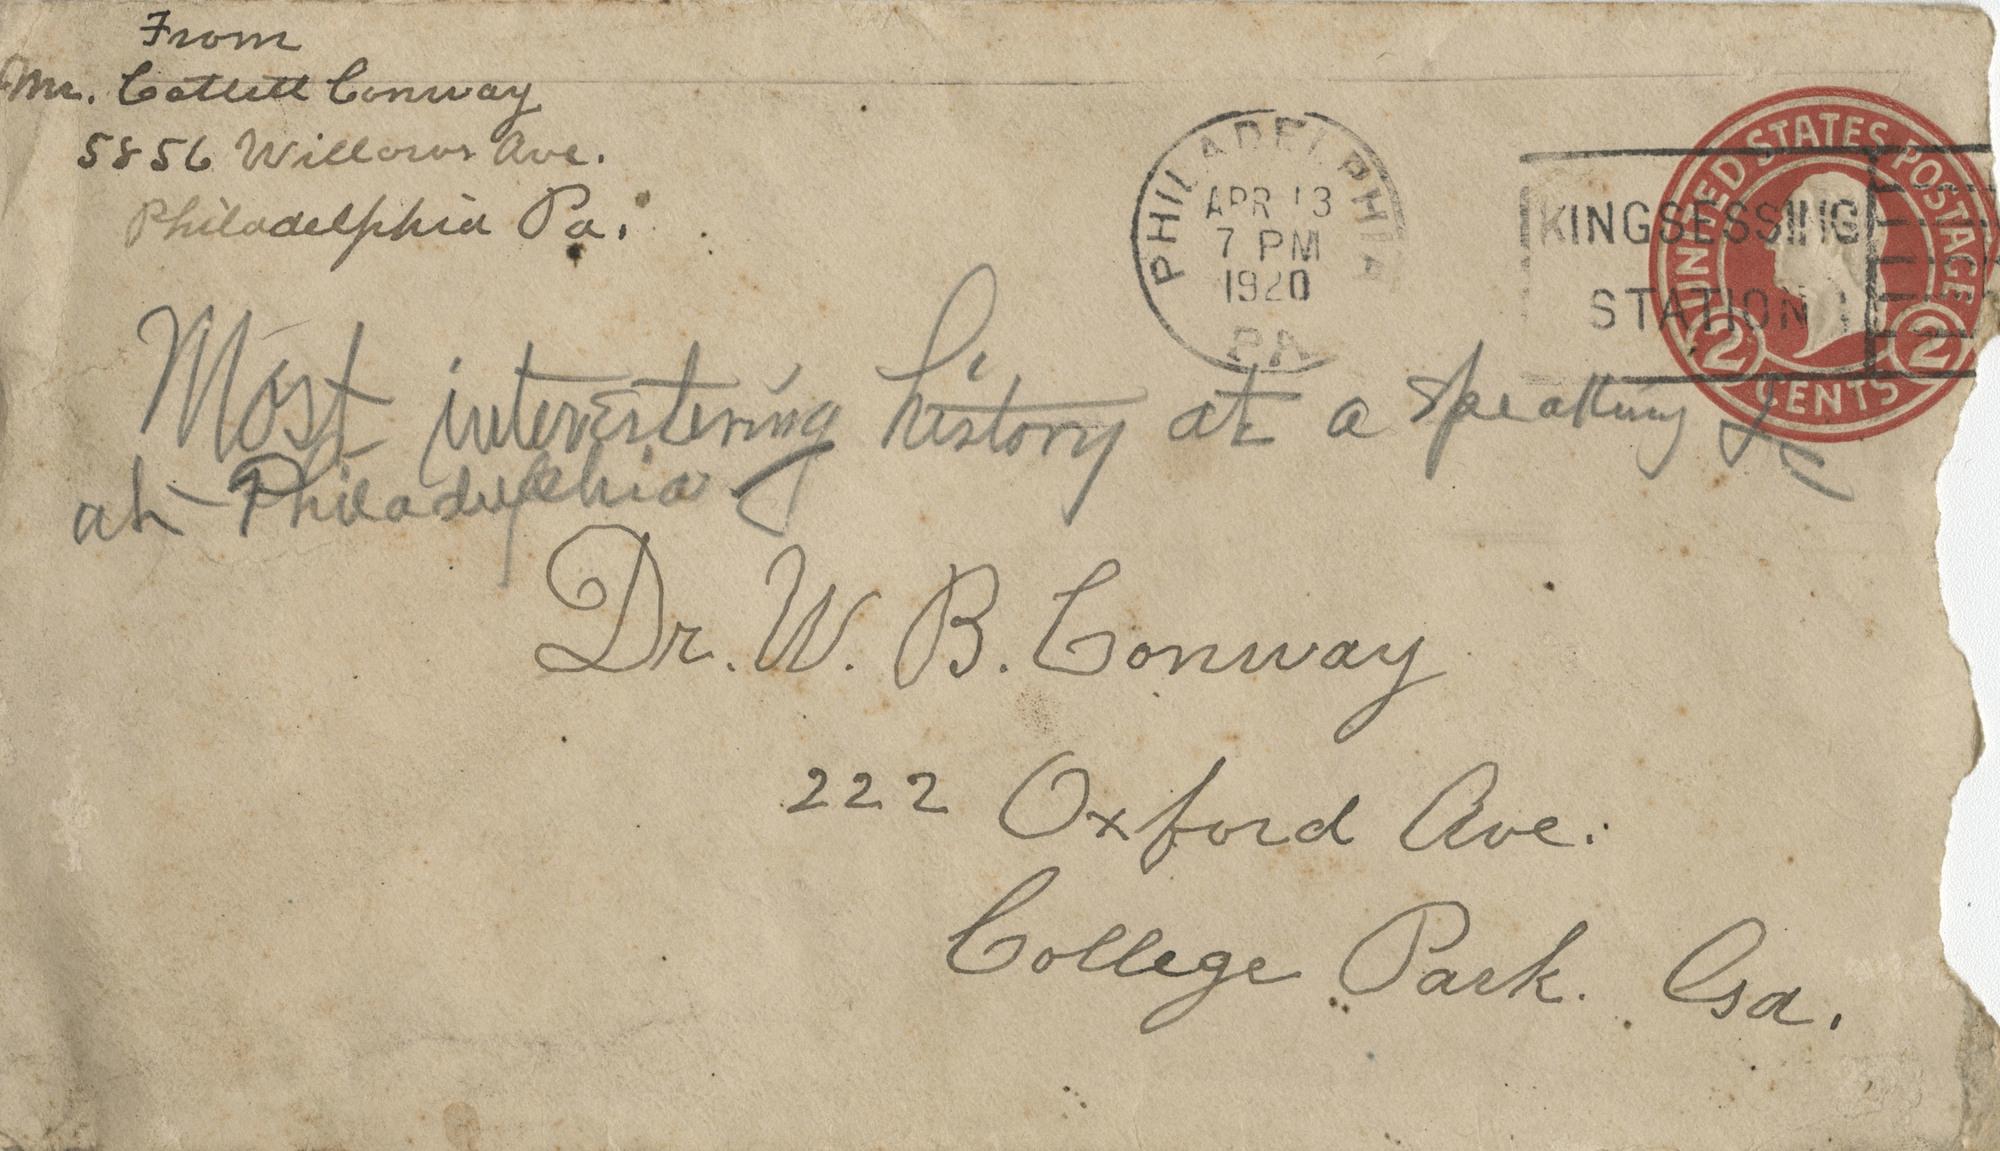 http://spec.lib.vt.edu/pickup/Omeka_upload/Ms2012-039_ConwayCatlett_F6_Letter_1920_04_enva.jpg